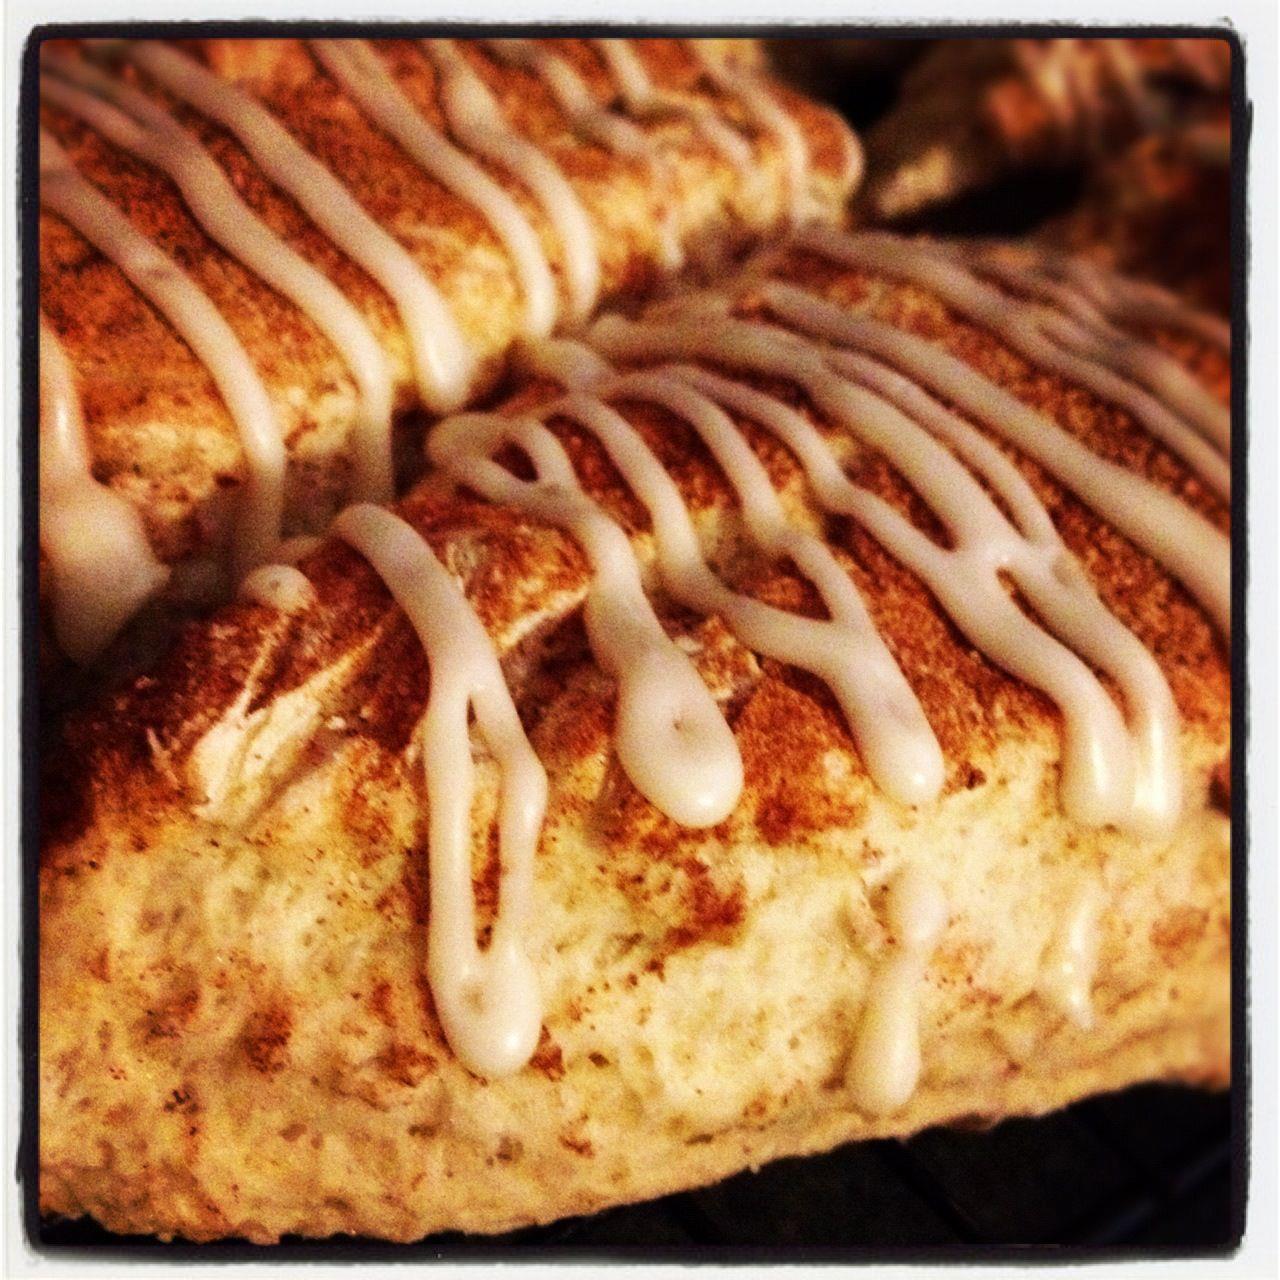 Yum Yum Bakery - image 3 - student project